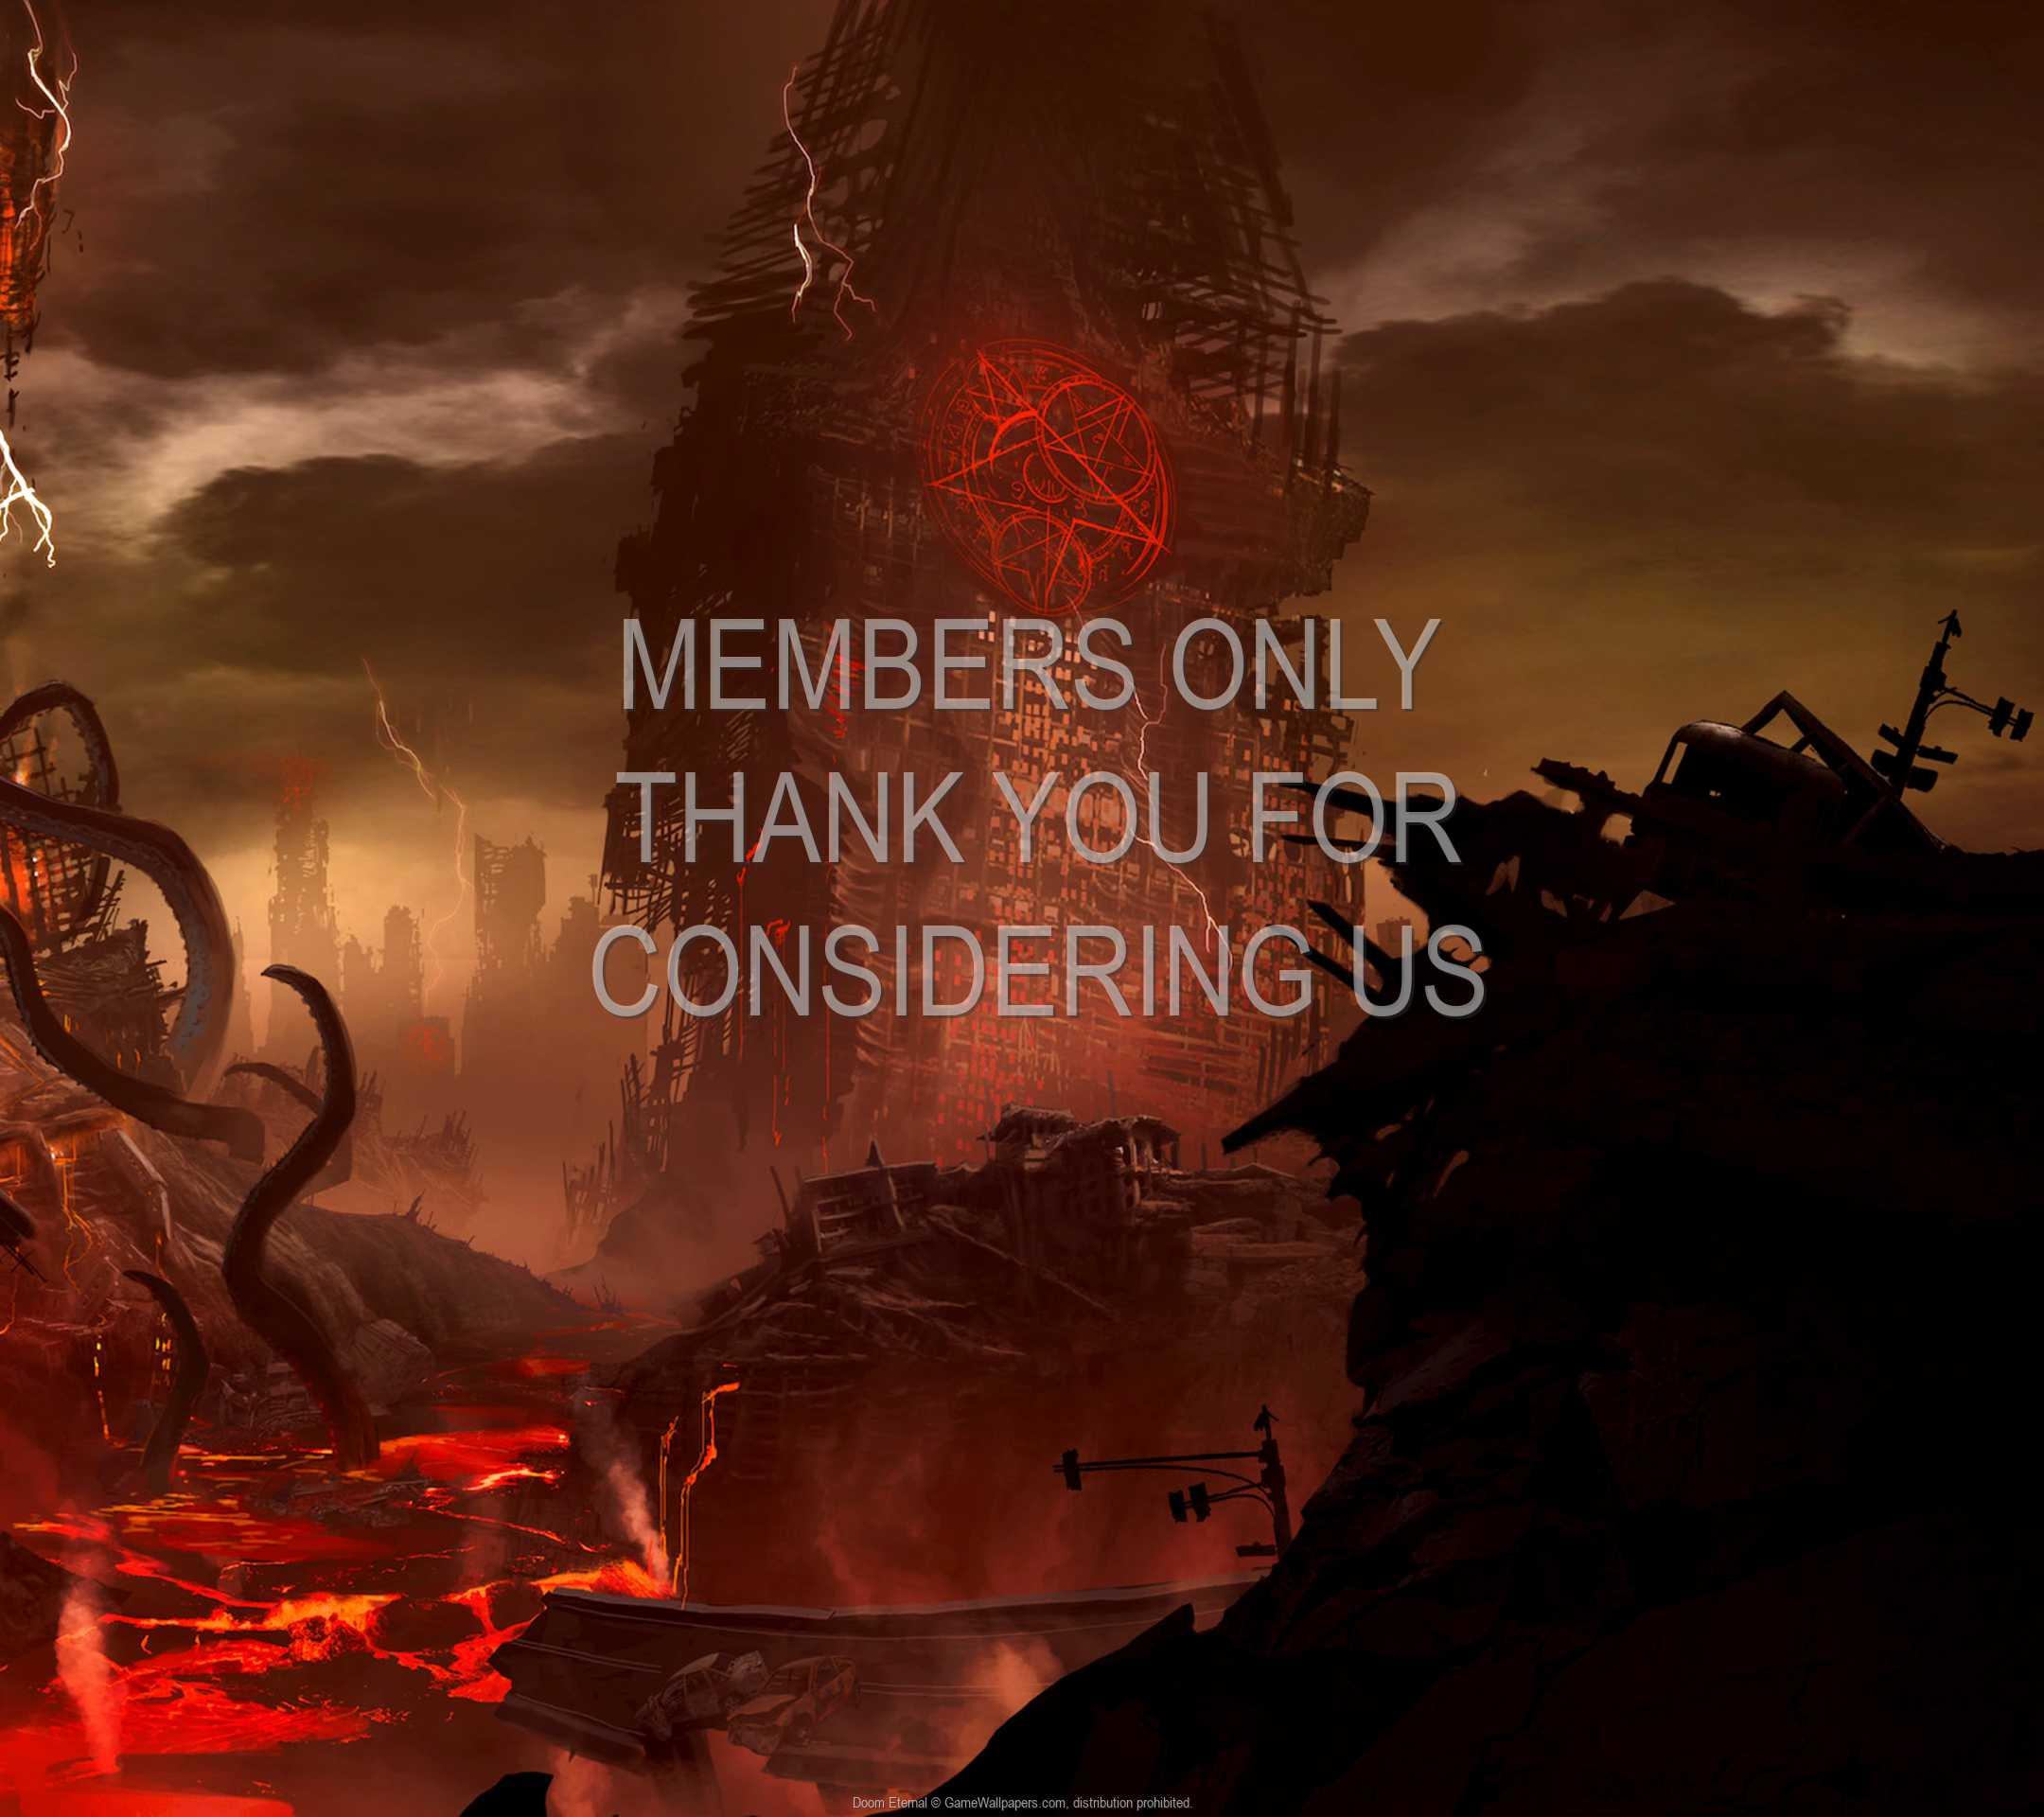 Doom Eternal 1080p Horizontal Mobile wallpaper or background 01